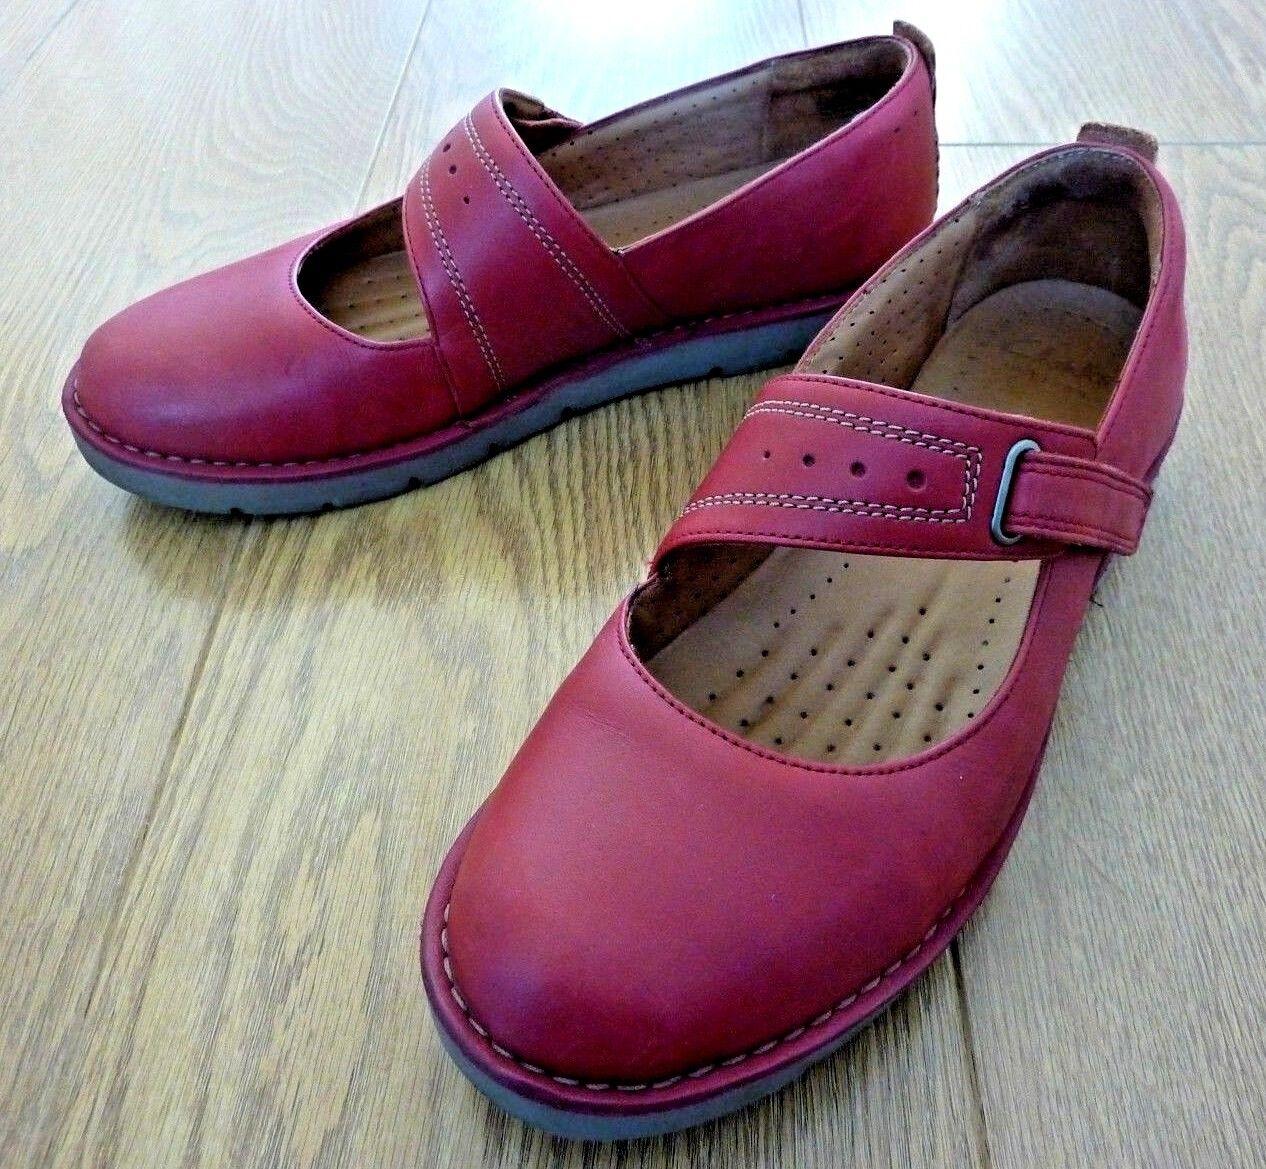 Clarks Unstructurojo Damas Mary Jane Planos Cuero Zapatos Talla Talla Talla EU 41M 7D Reino Unido  grandes ofertas